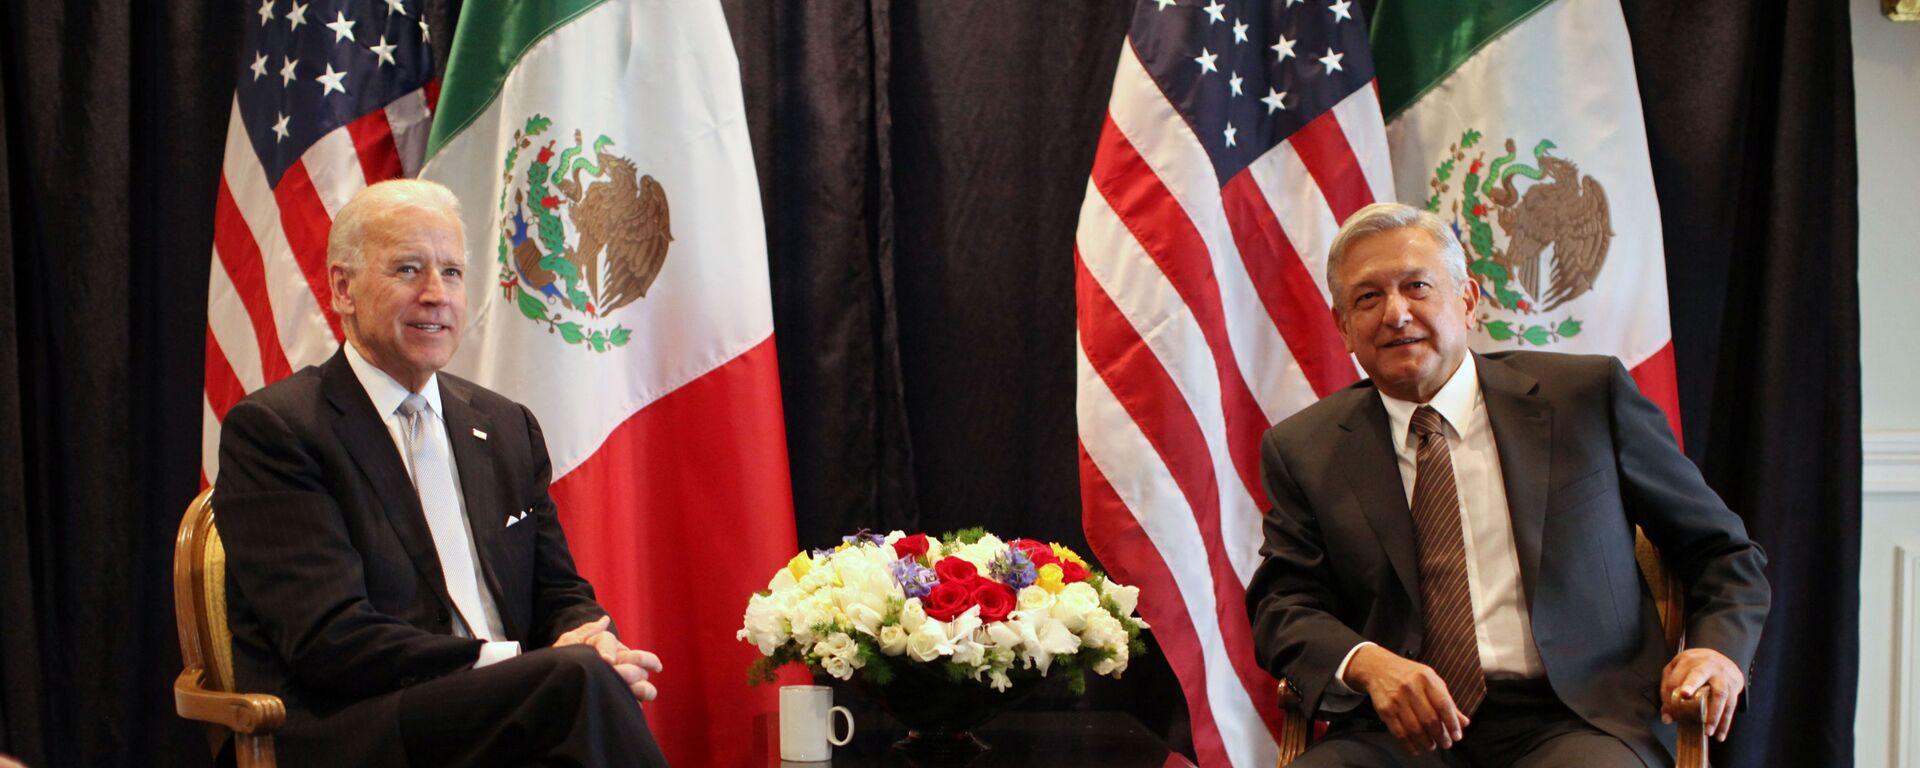 Joe Biden y Andrés Manuel López Obrador, 2012 - Sputnik Mundo, 1920, 11.08.2021